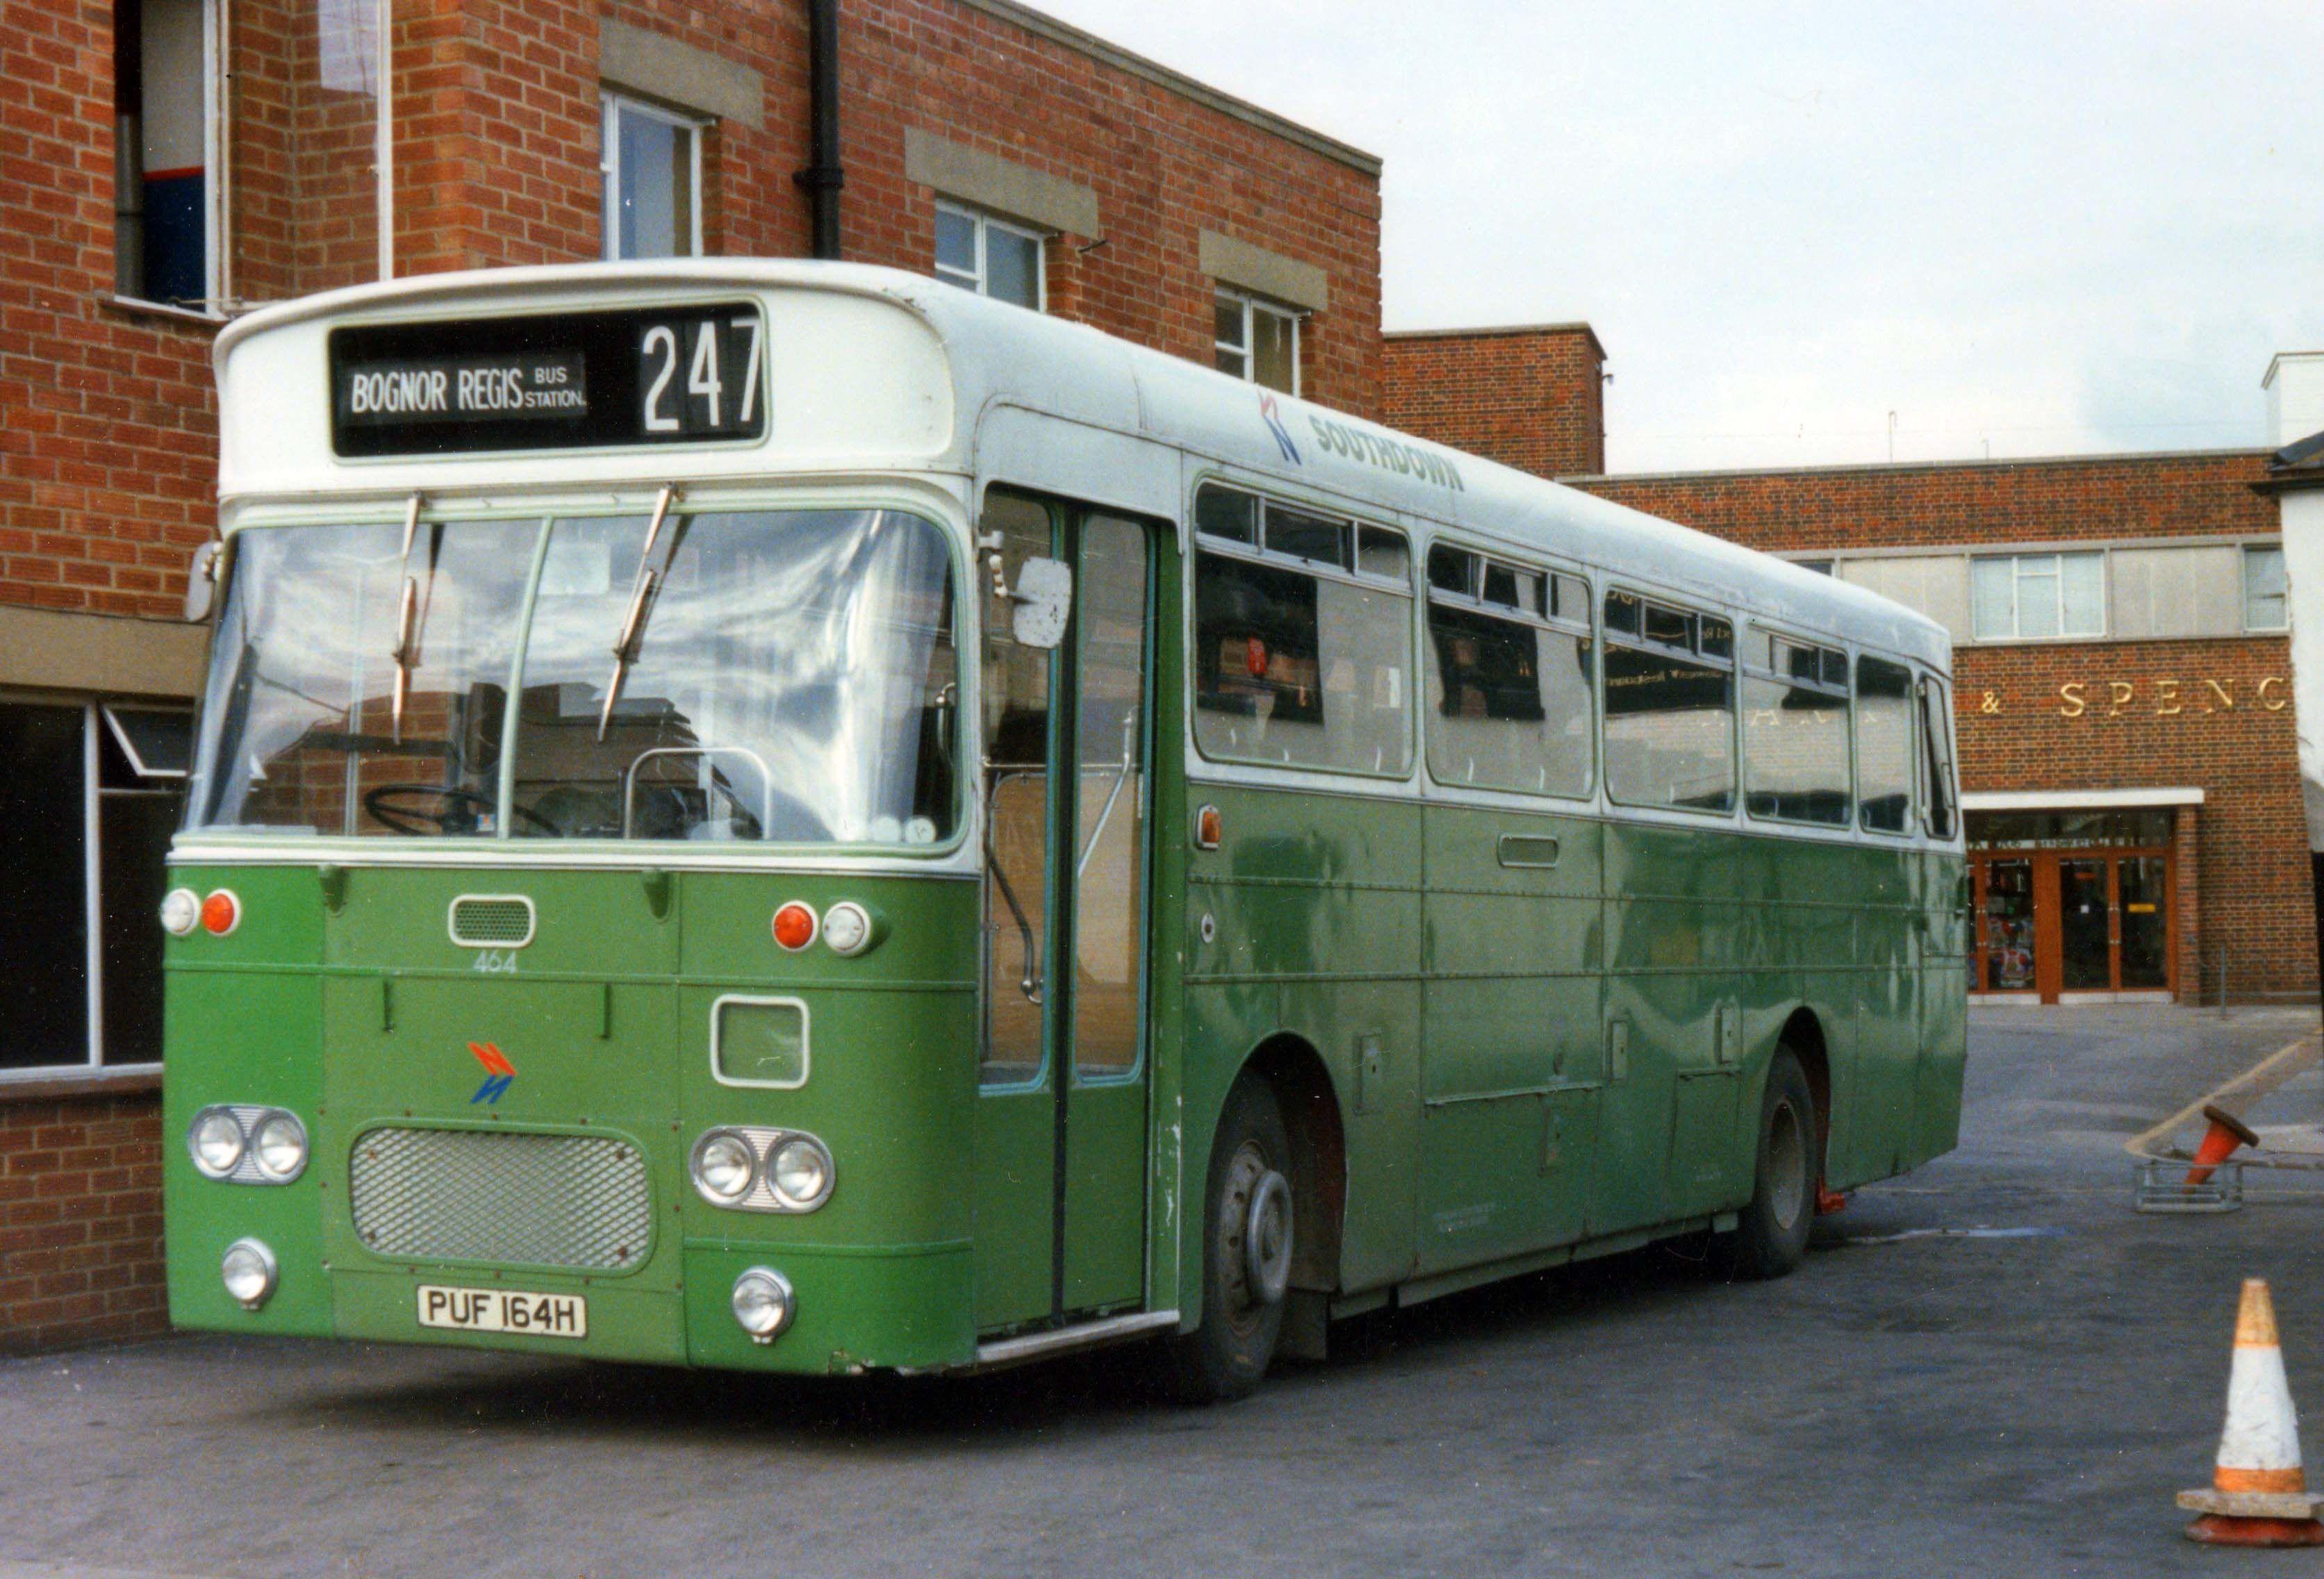 Bognor 247 Bus With Images Bus Bognor Regis Seaside Towns